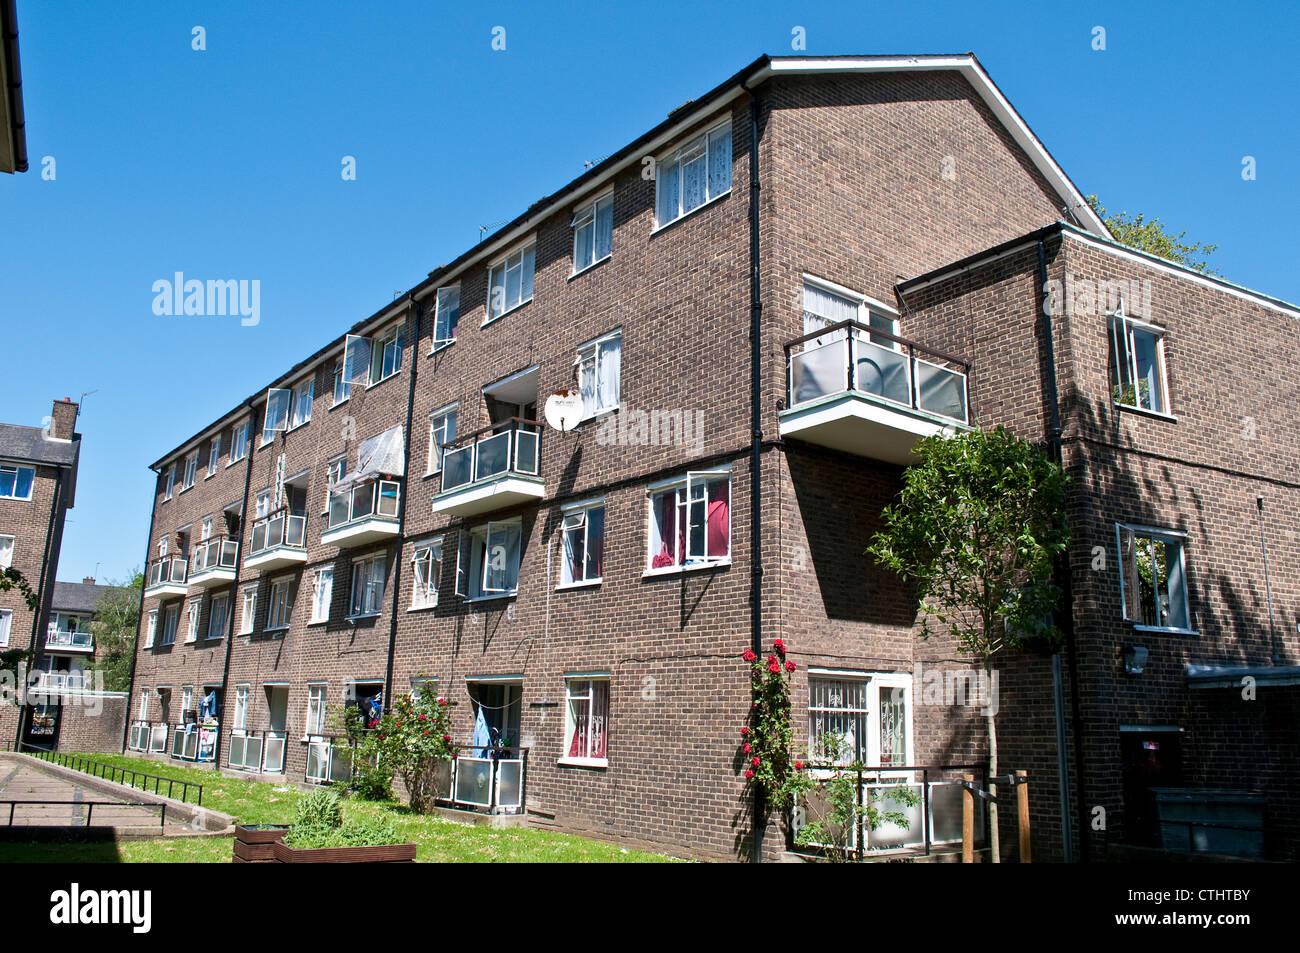 Council estate, Southey Road, Brixton, SW9, London, UK - Stock Image